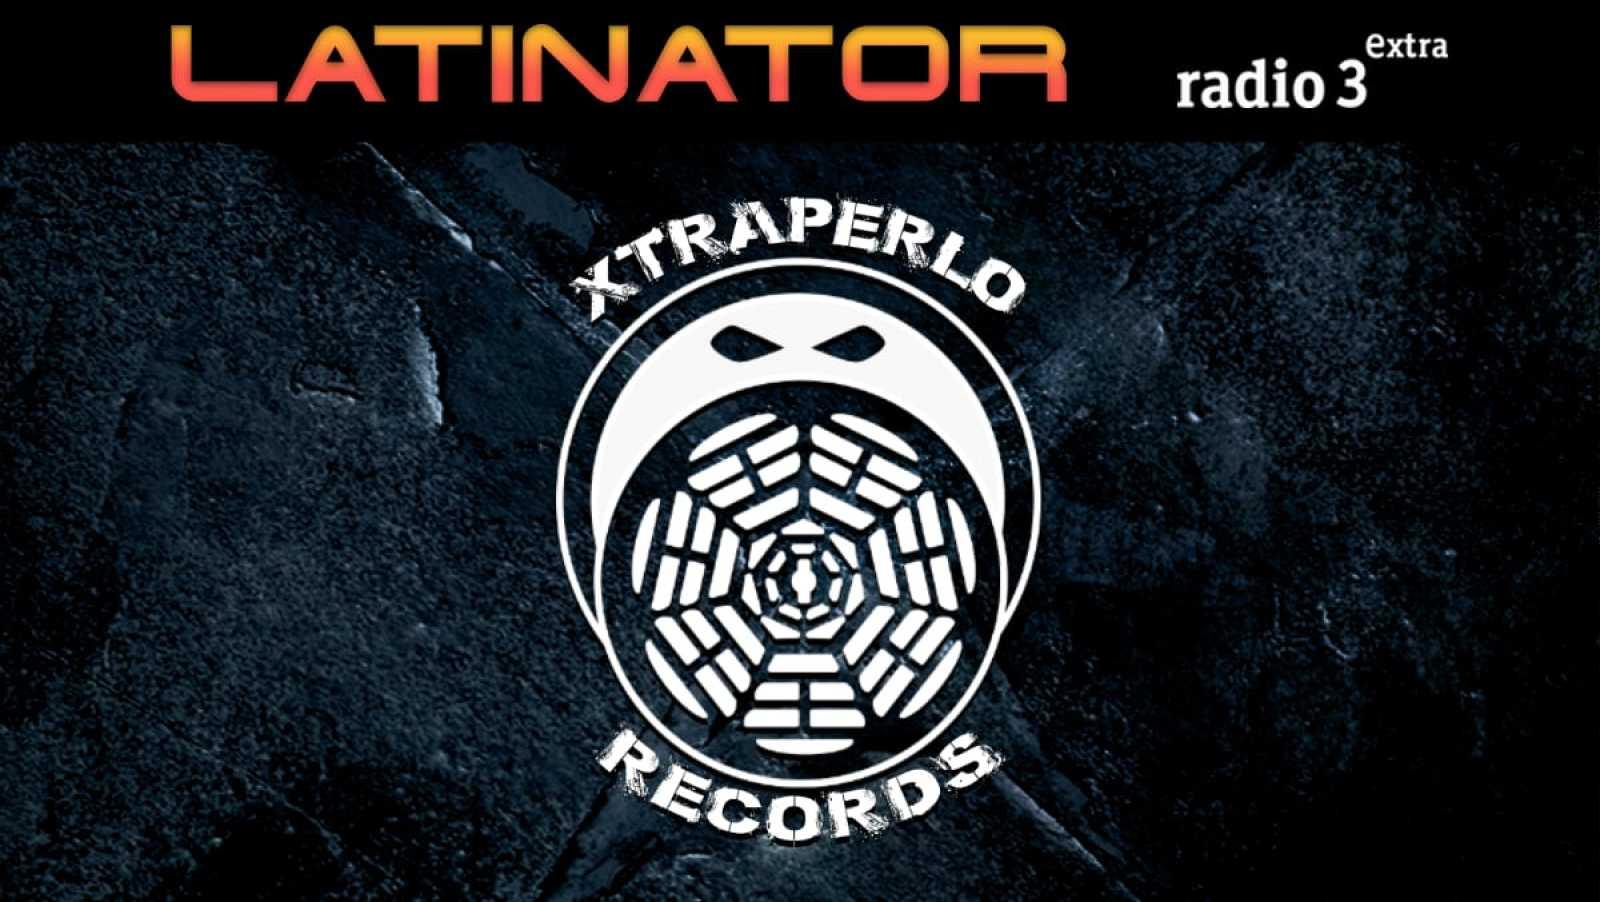 Latinator - Xtraperlo Records - 19/03/20 - escuchar ahora